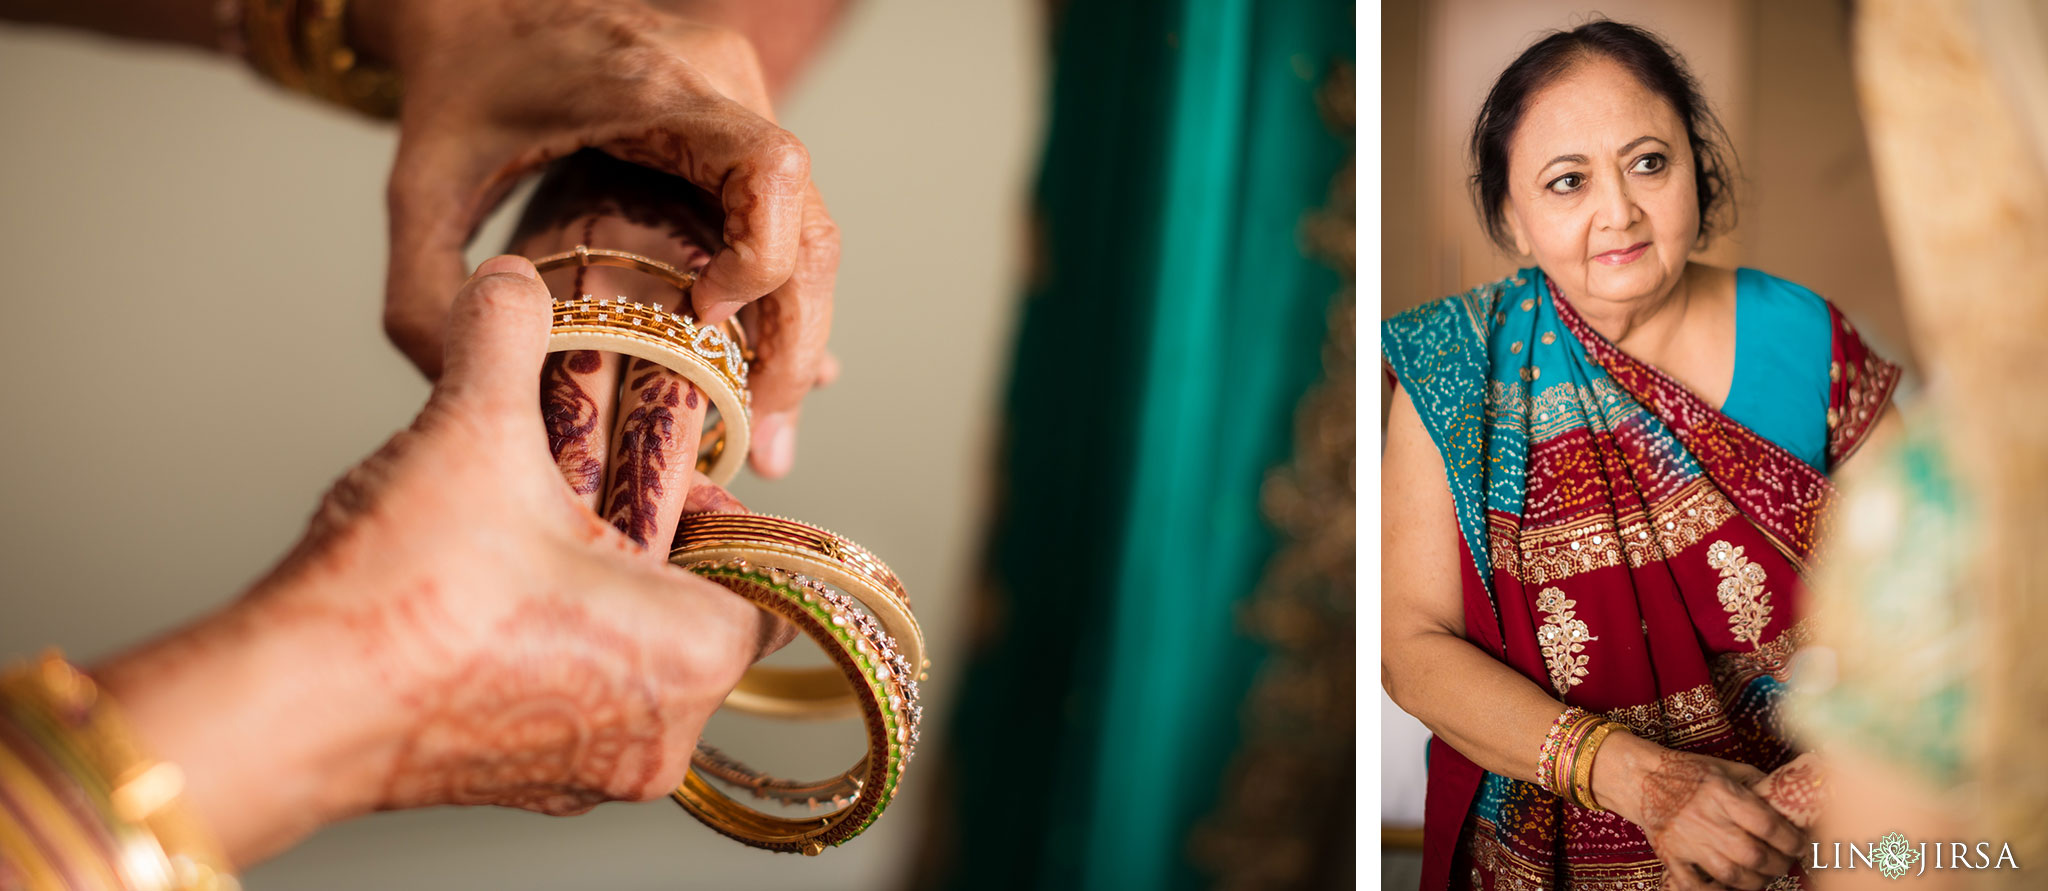 03 pasea hotel and spa huntington beach indian bride wedding photography